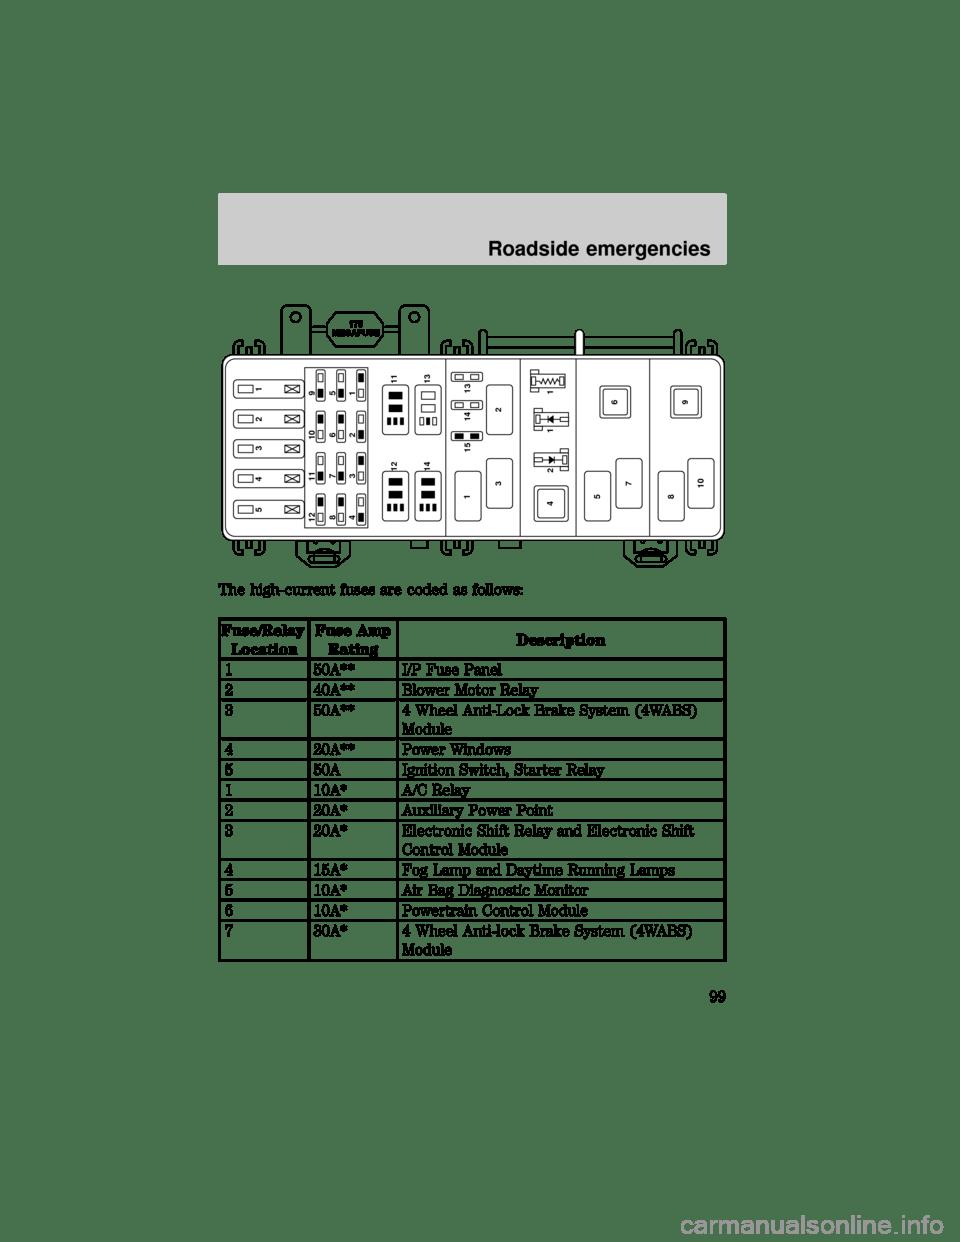 1998 Ford Ranger Service Manual